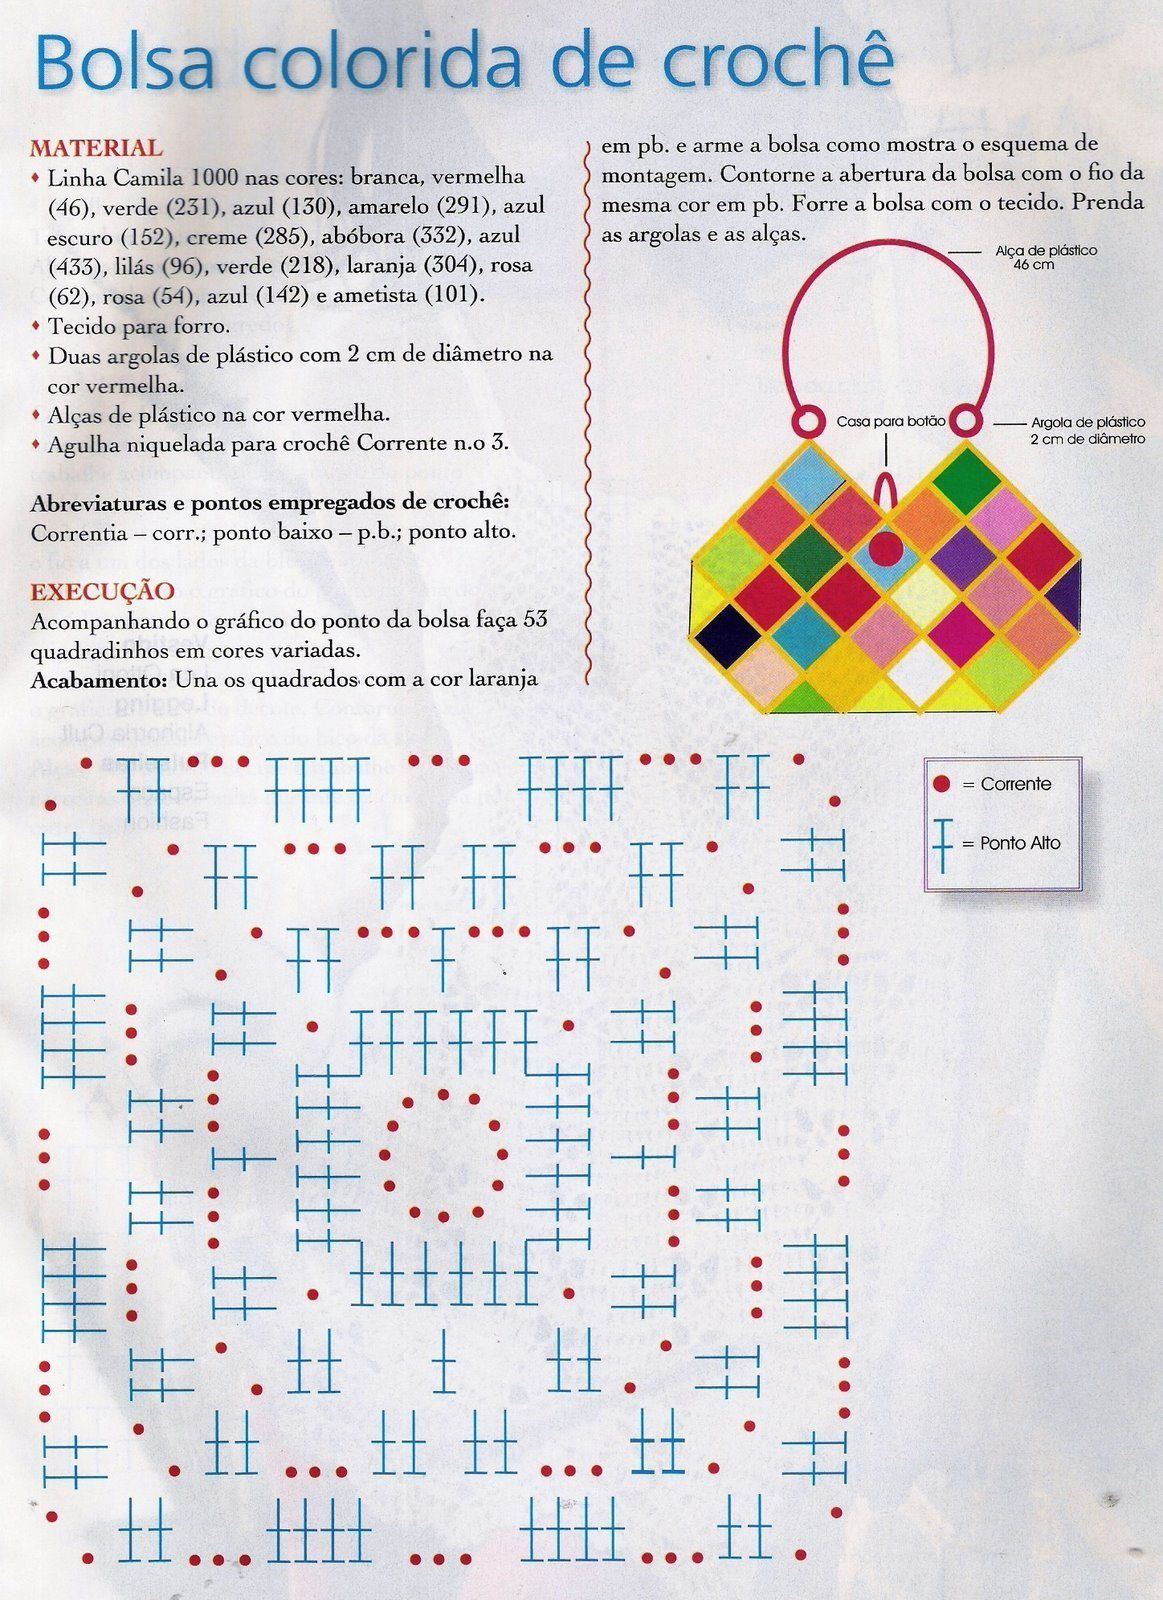 Patrones Crochet: Bolso Cuadros-Rombos Crochet Patron | Grannys ...